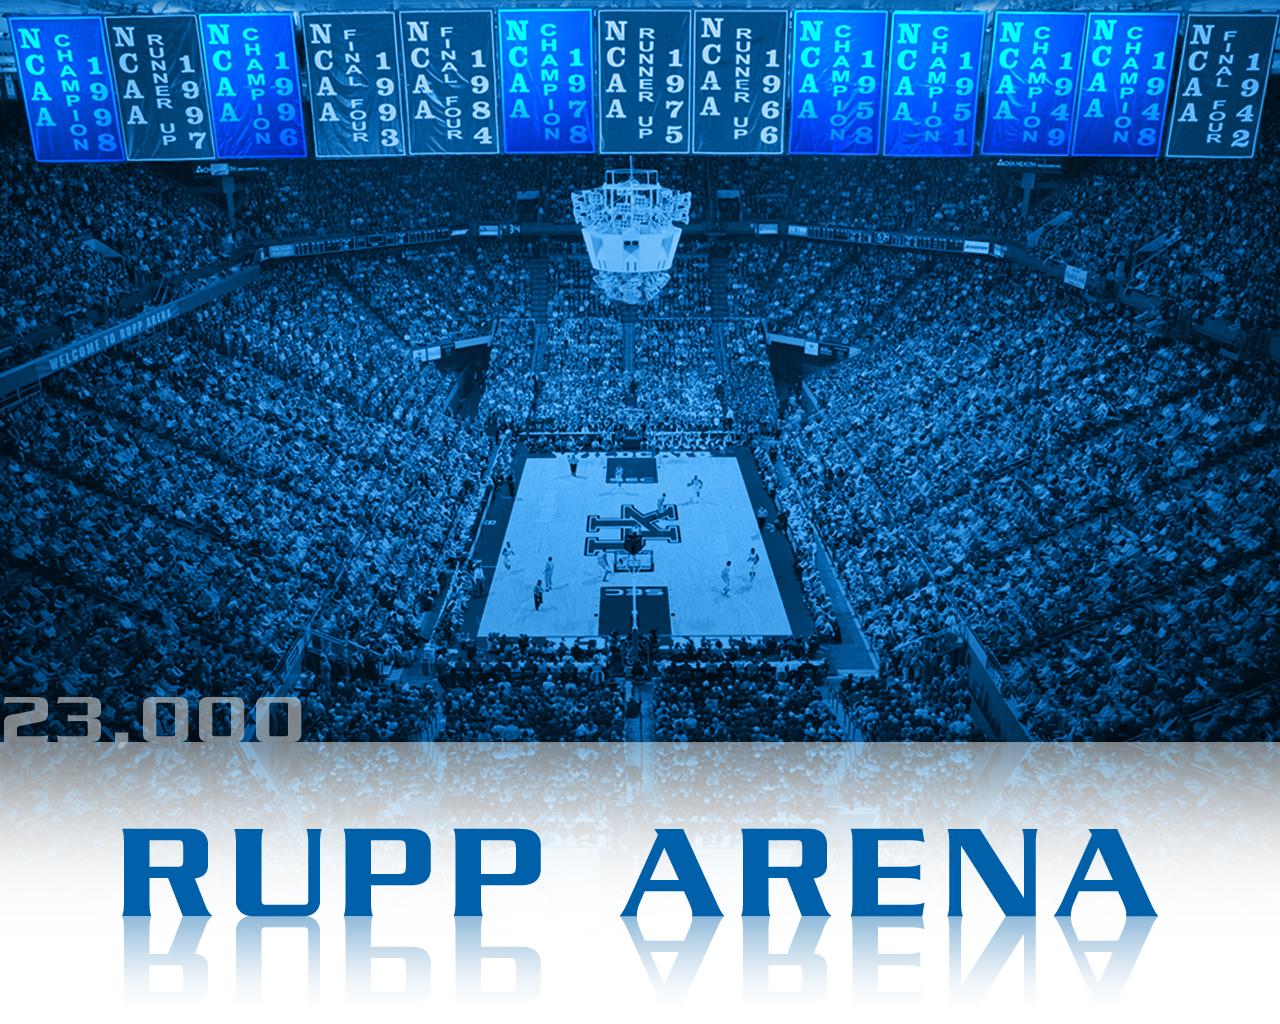 Kentucky Wildcats Basketball Wallpapers The Art Mad Wallpapers 1280x1024